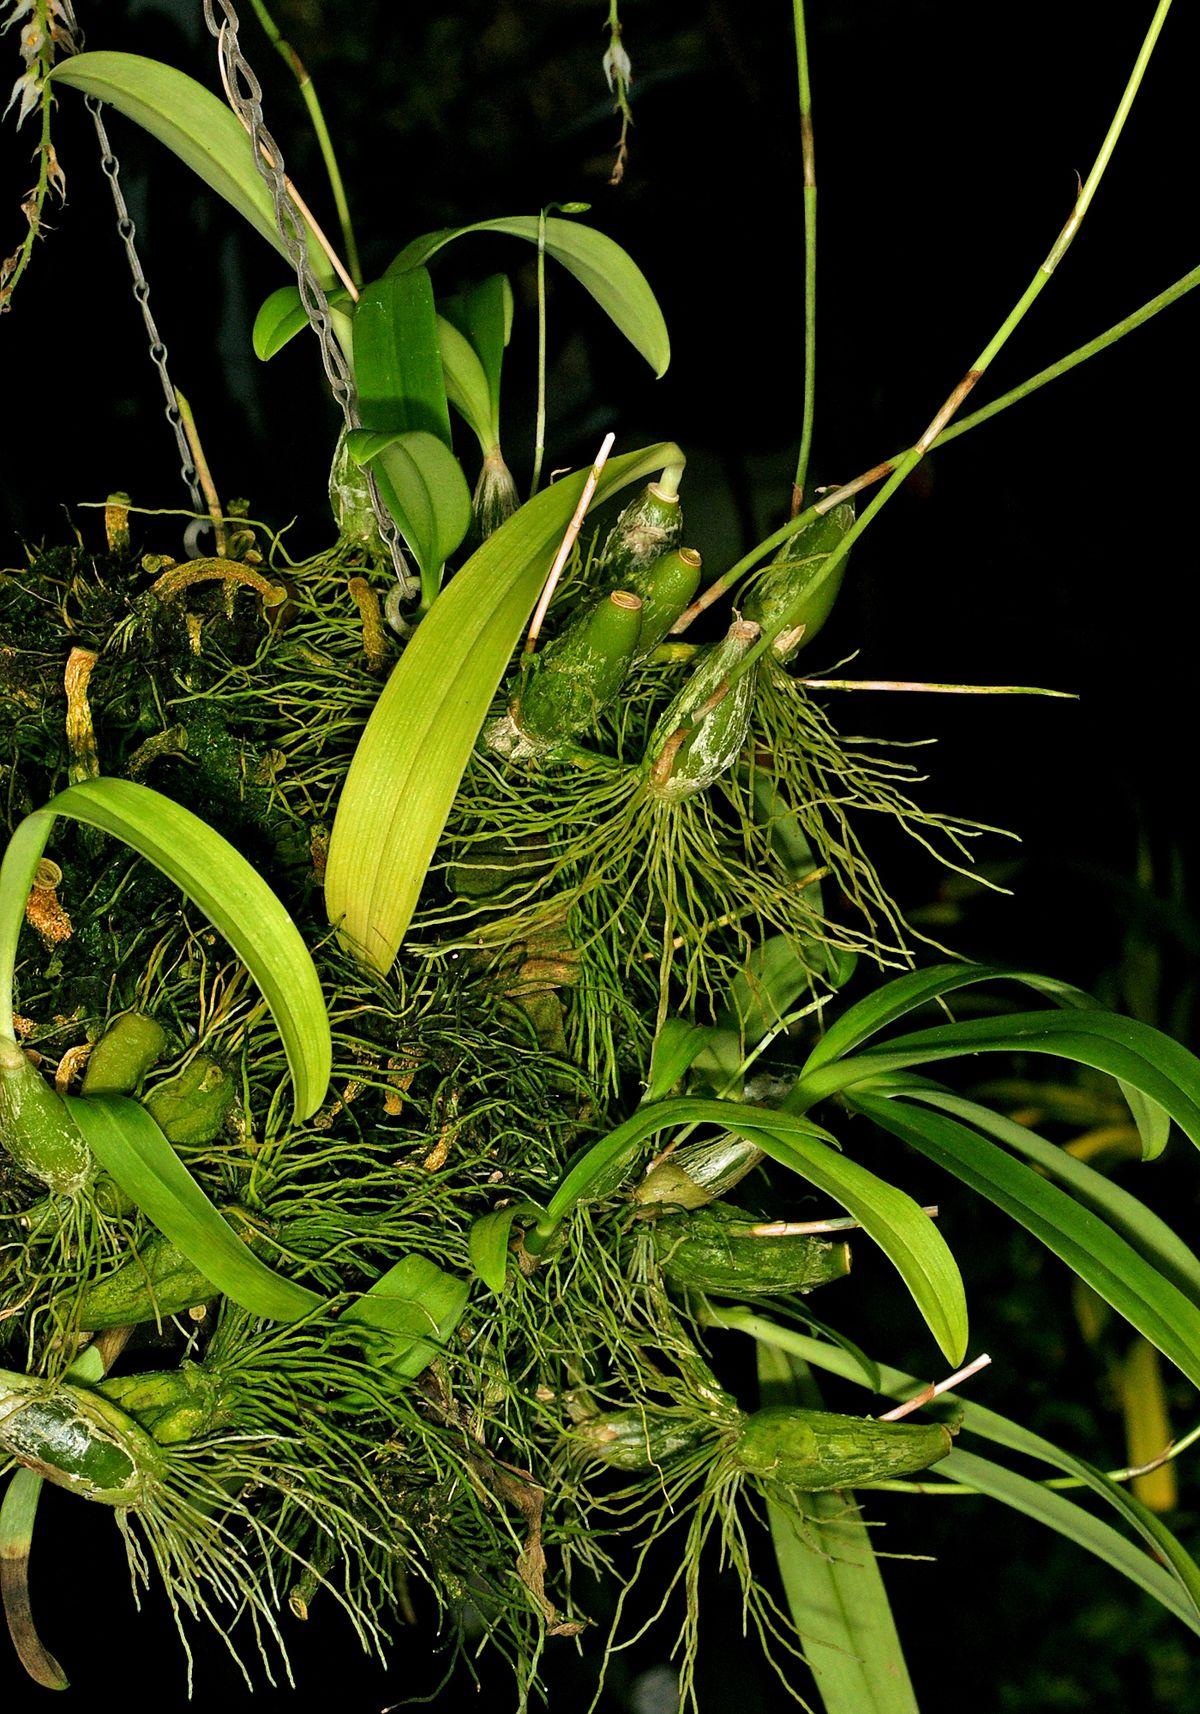 Bulbophyllum hirtum - Wikimedia Commons